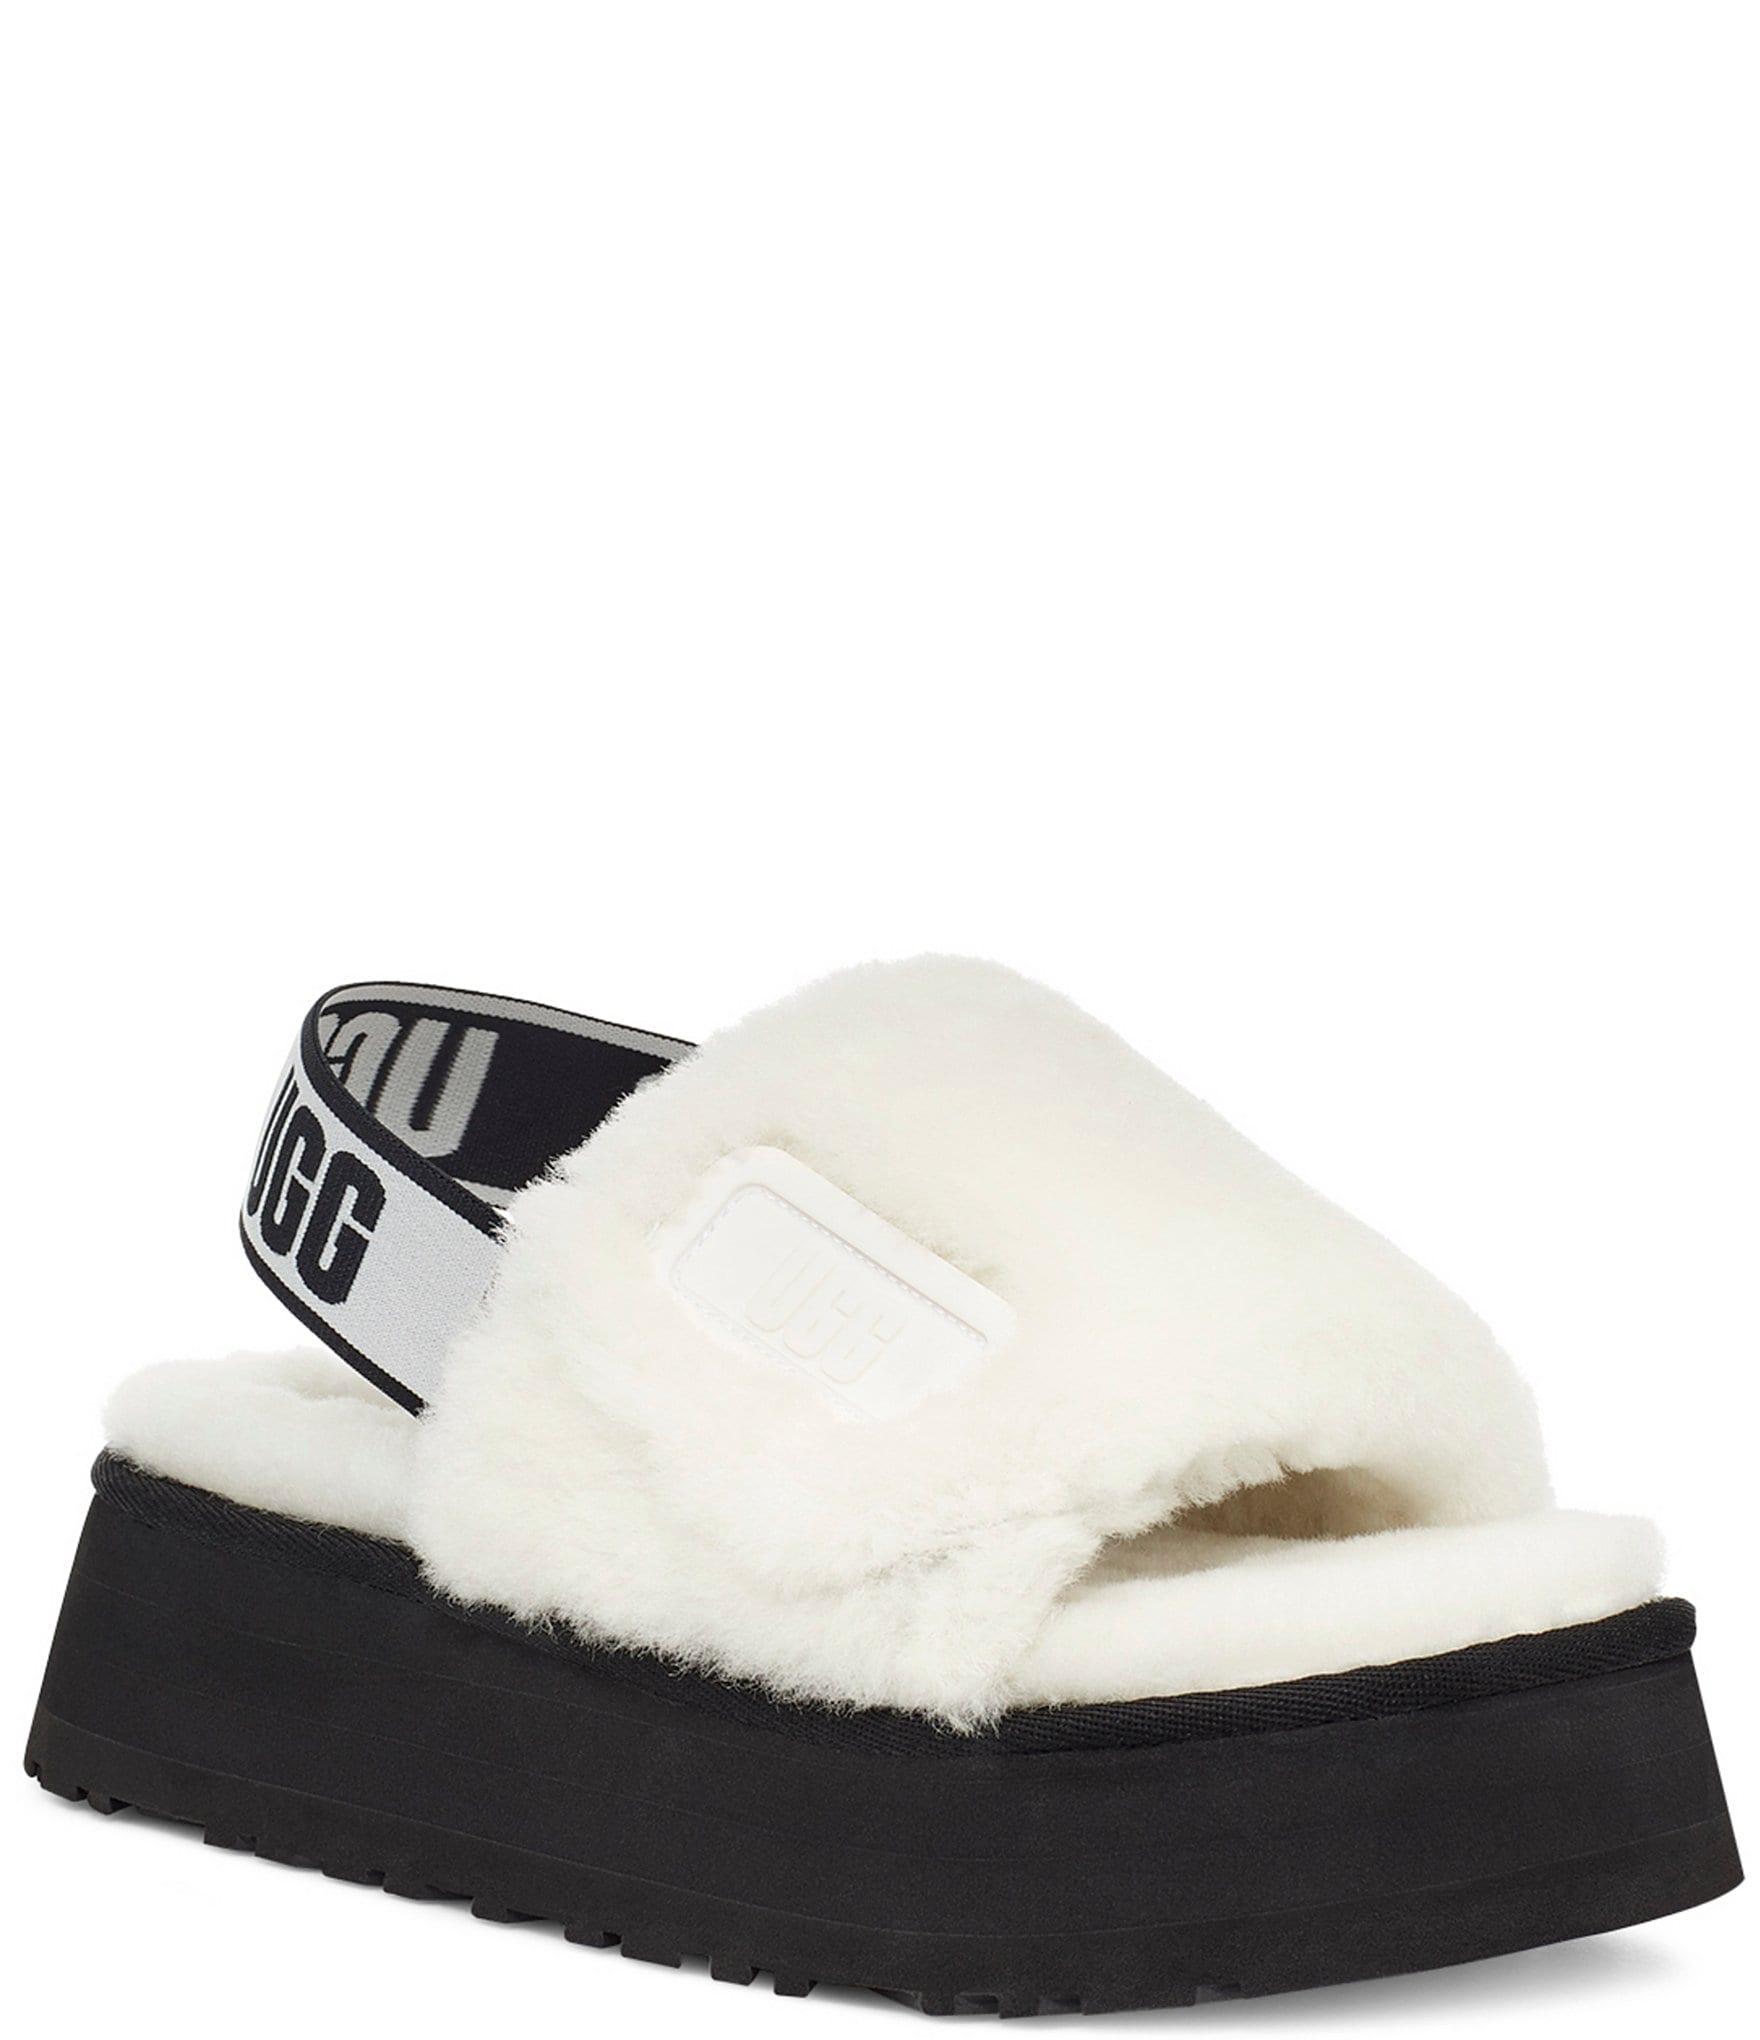 UGG® Disco Slide Sandals | Dillard's